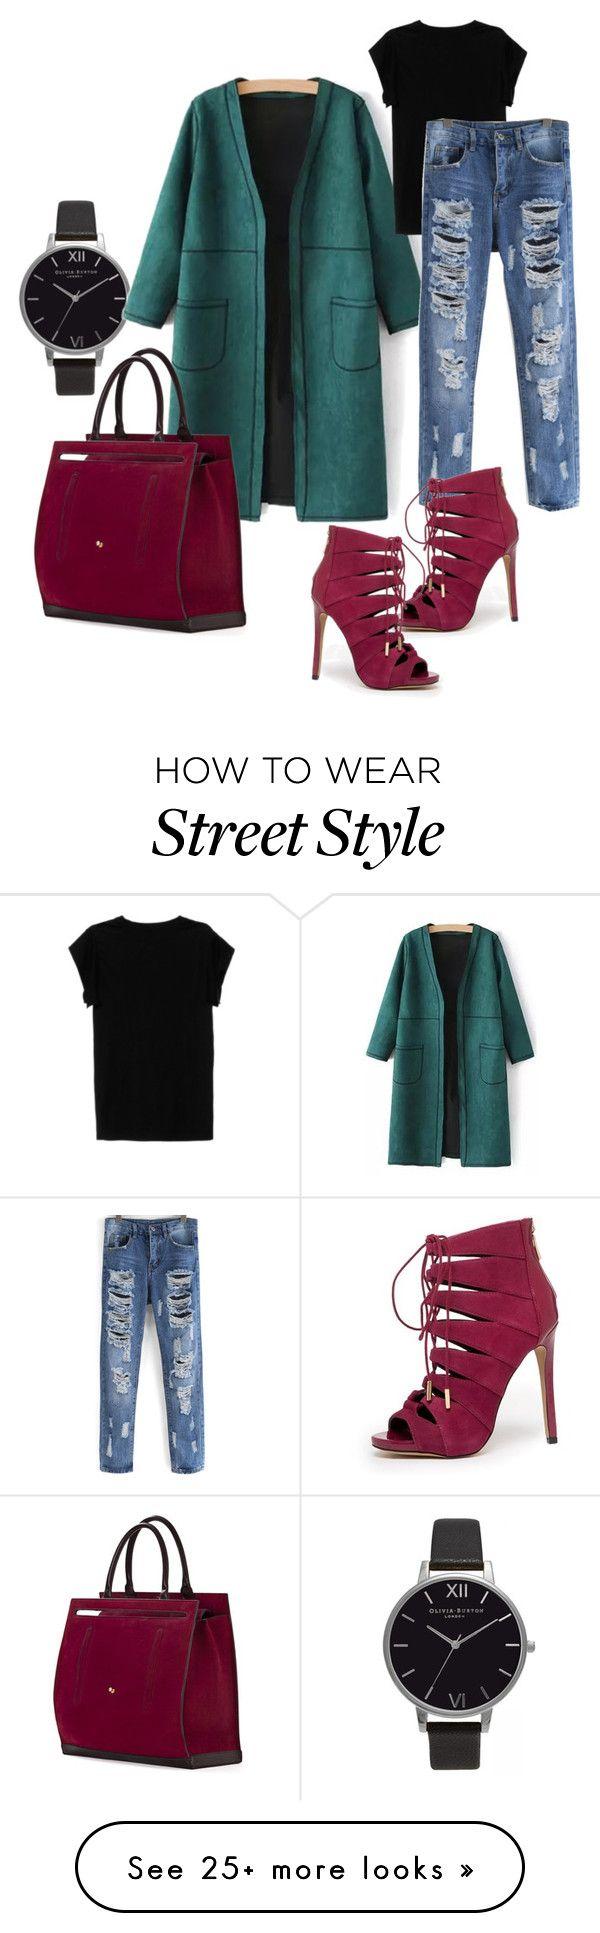 """Street style 2"" by athinakpebor on Polyvore featuring moda, Olivia Burton, Isabel Marant, Bebe e Cambiaghi"